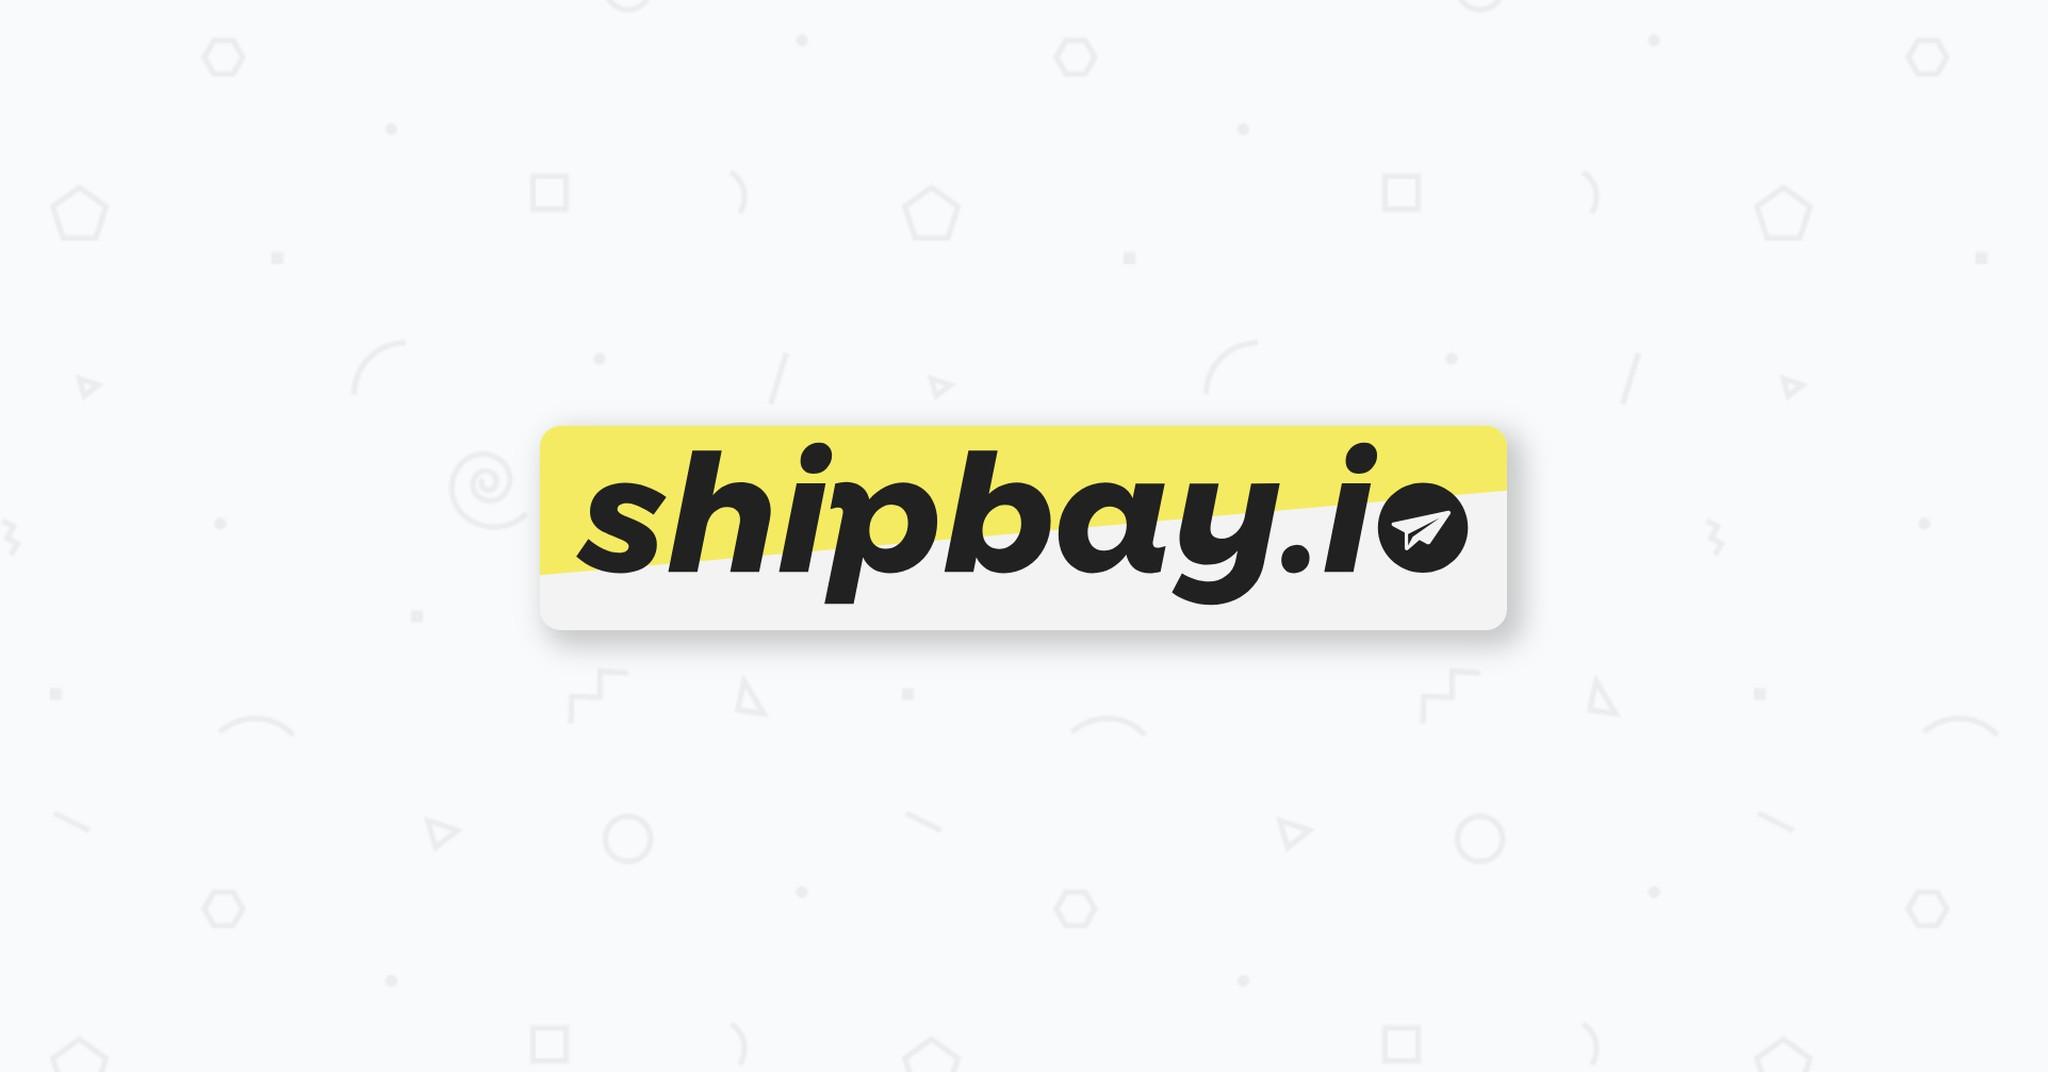 shipbay.io